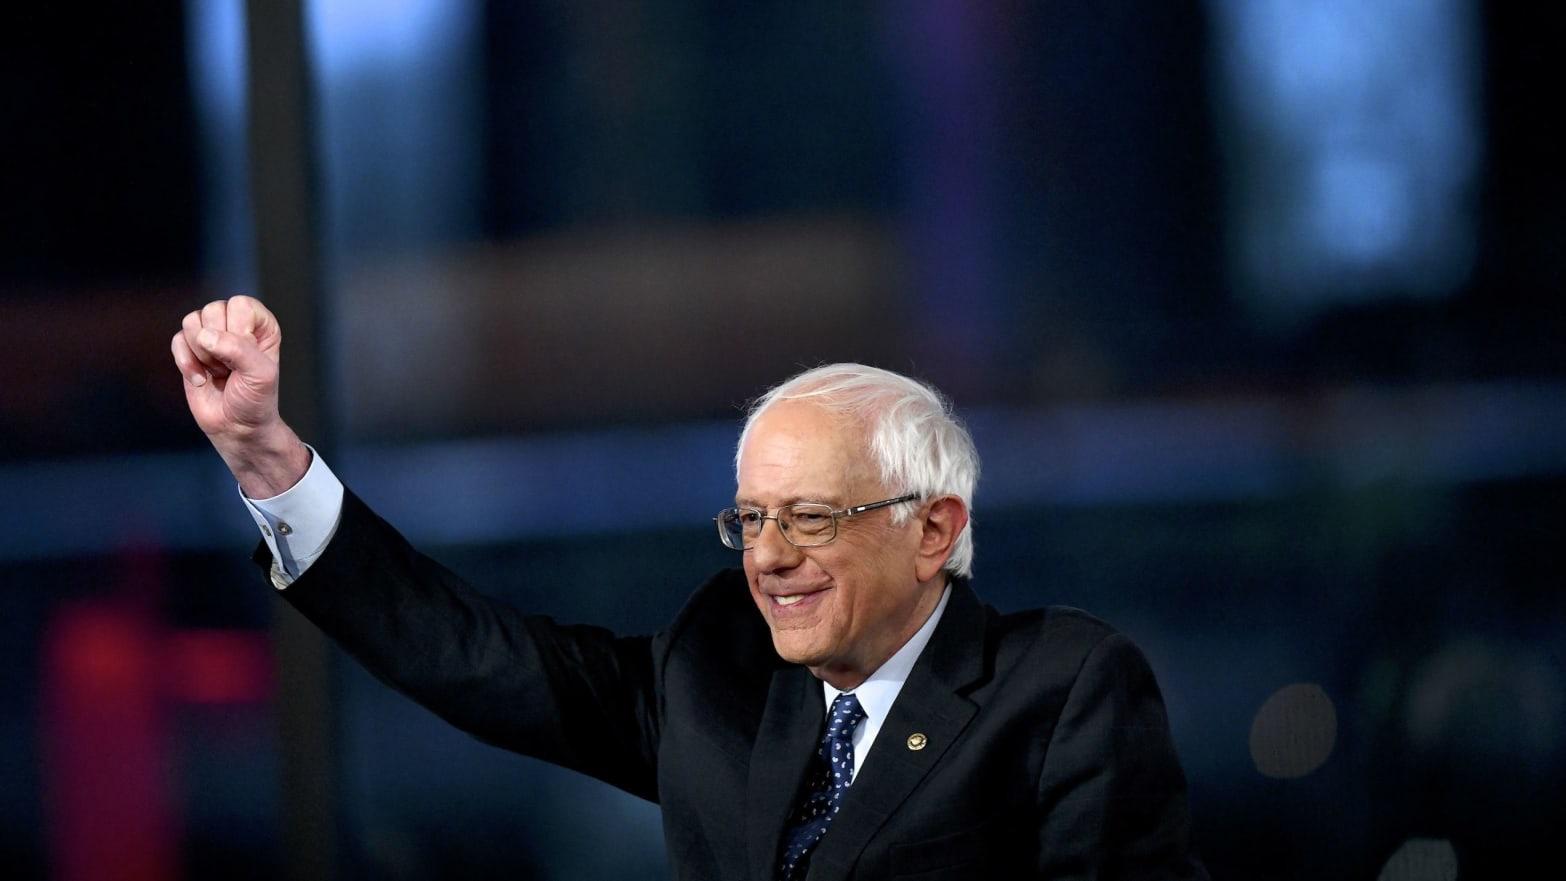 Bernie Sanders Calls on Mitch McConnell to put $15 Minimum Wage Bill on the Senate Floor